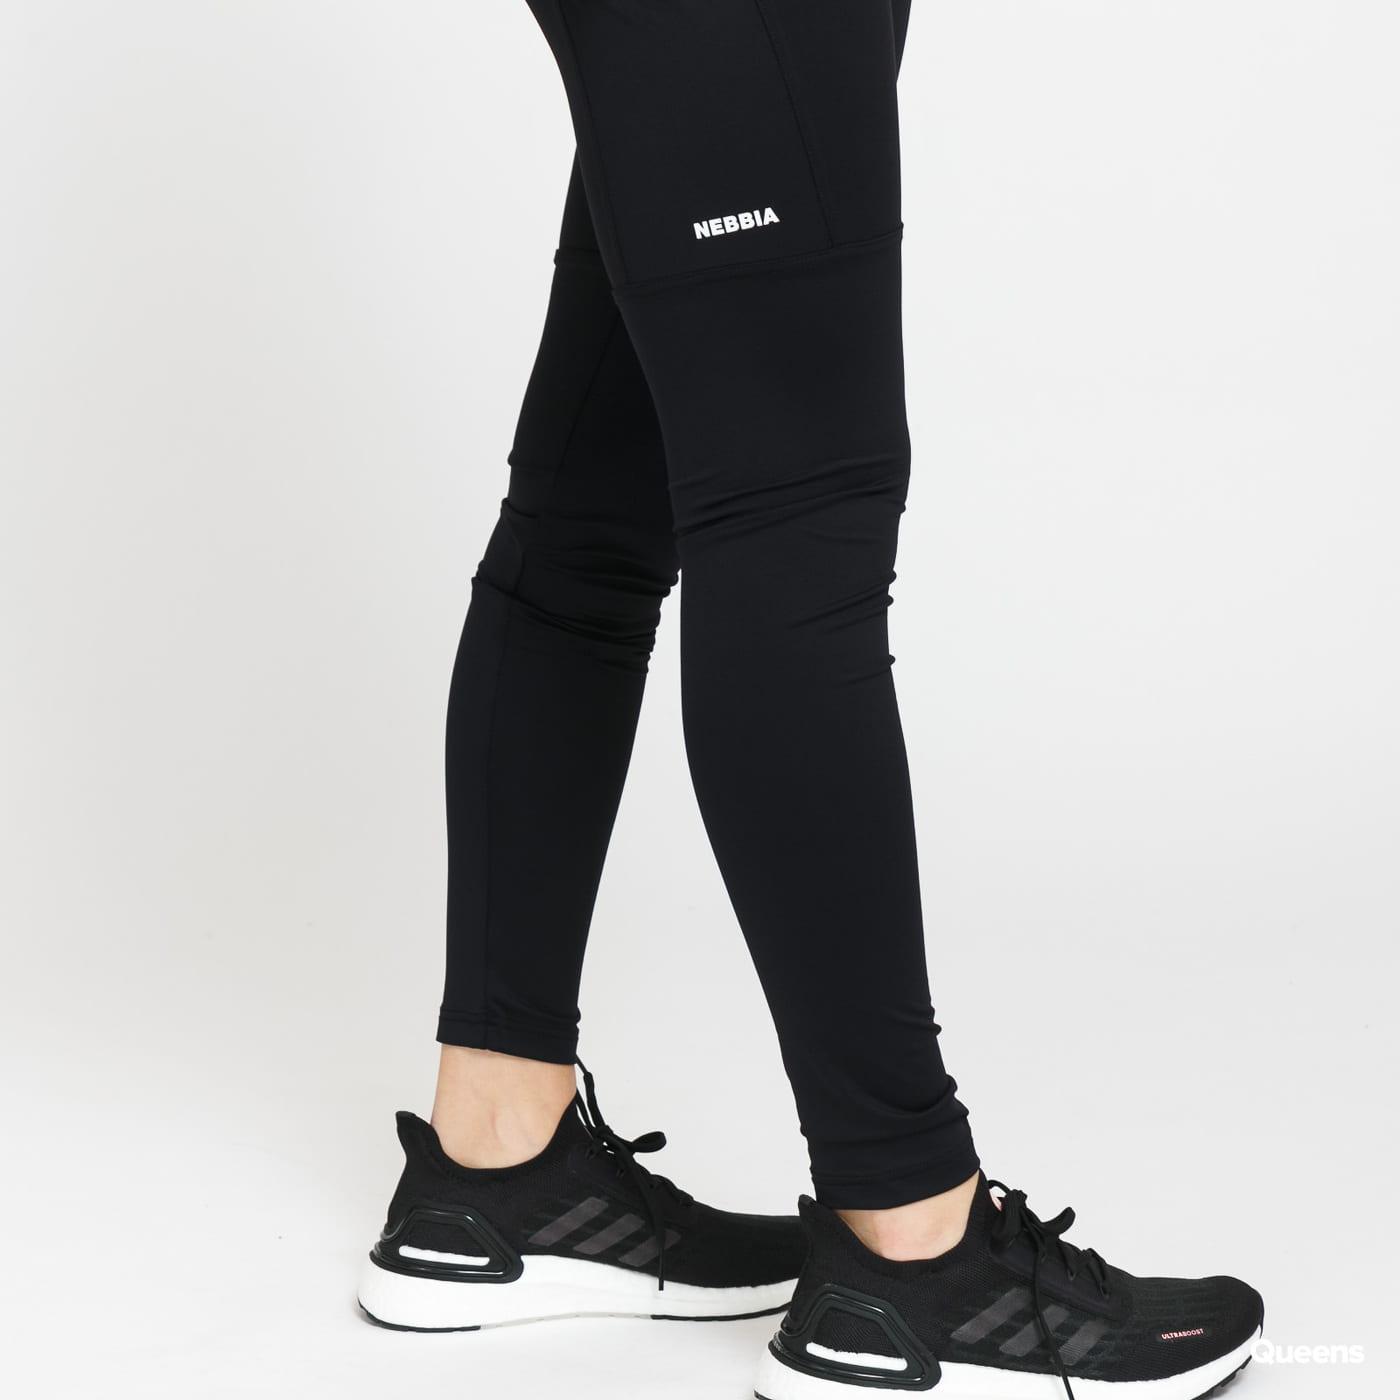 Nebbia High Waist Fit&Smart Leggings černé